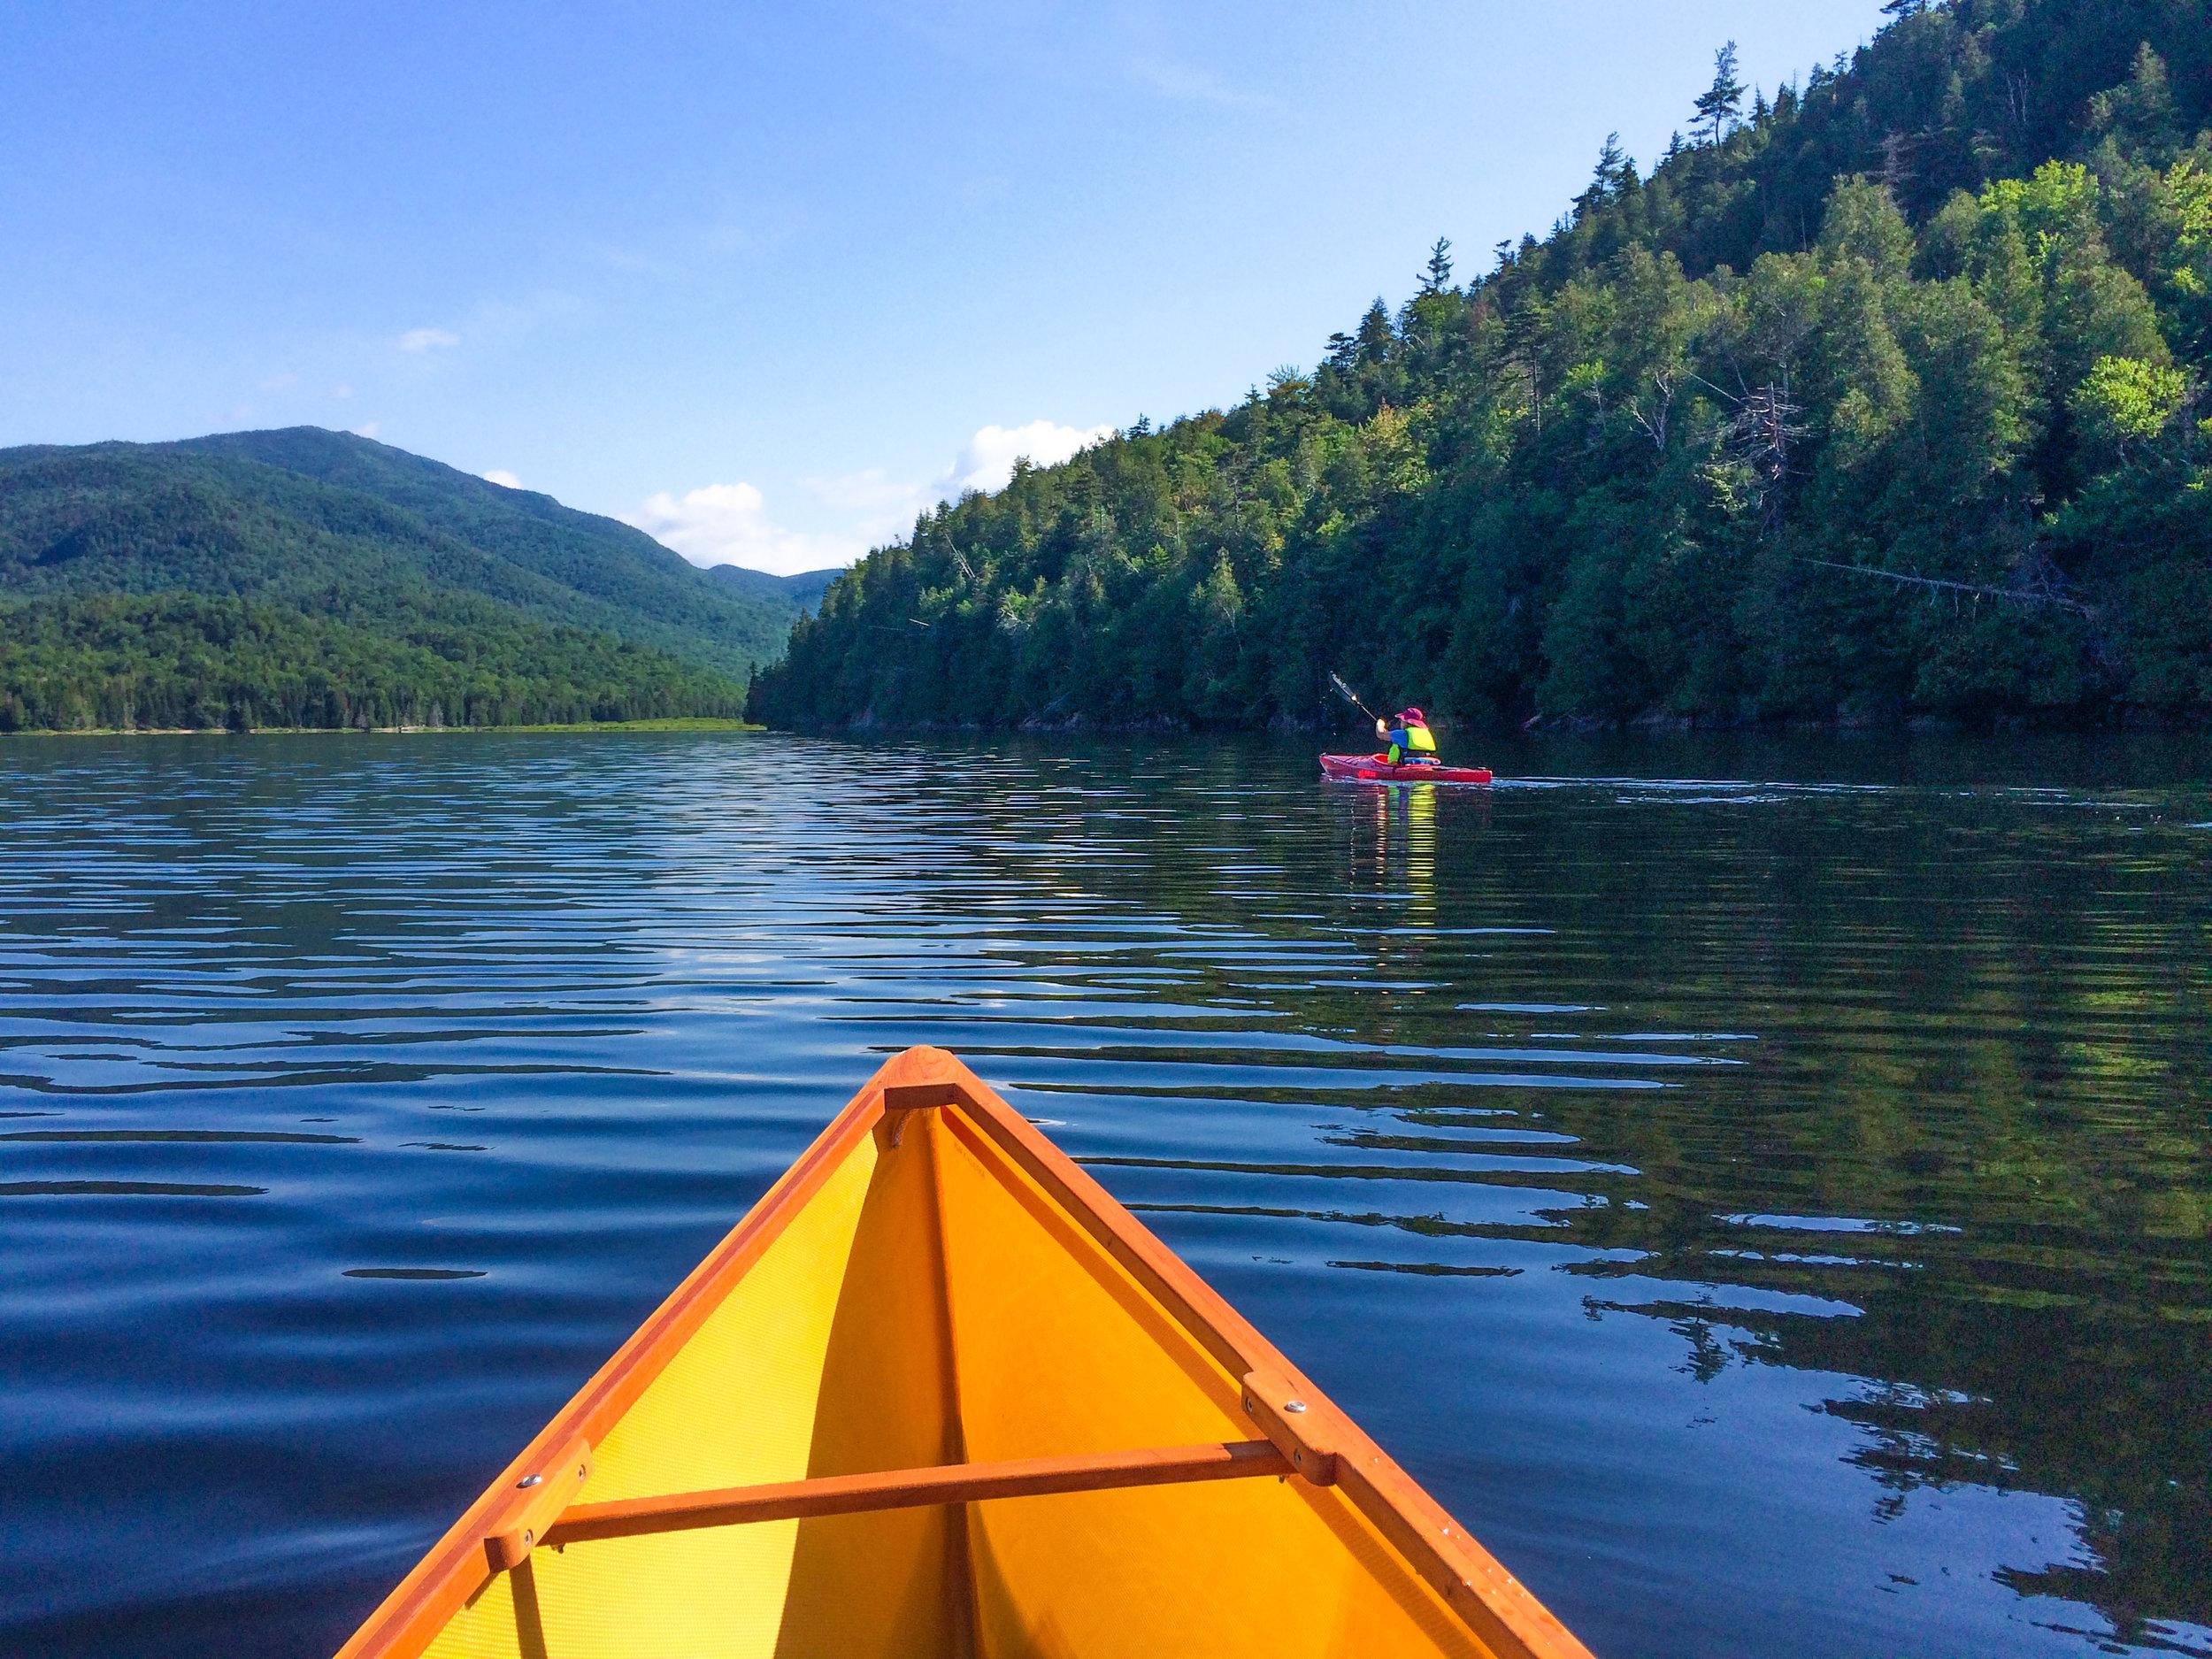 Canoeing on Henderson Lake in Newcomb. Skip Holmes